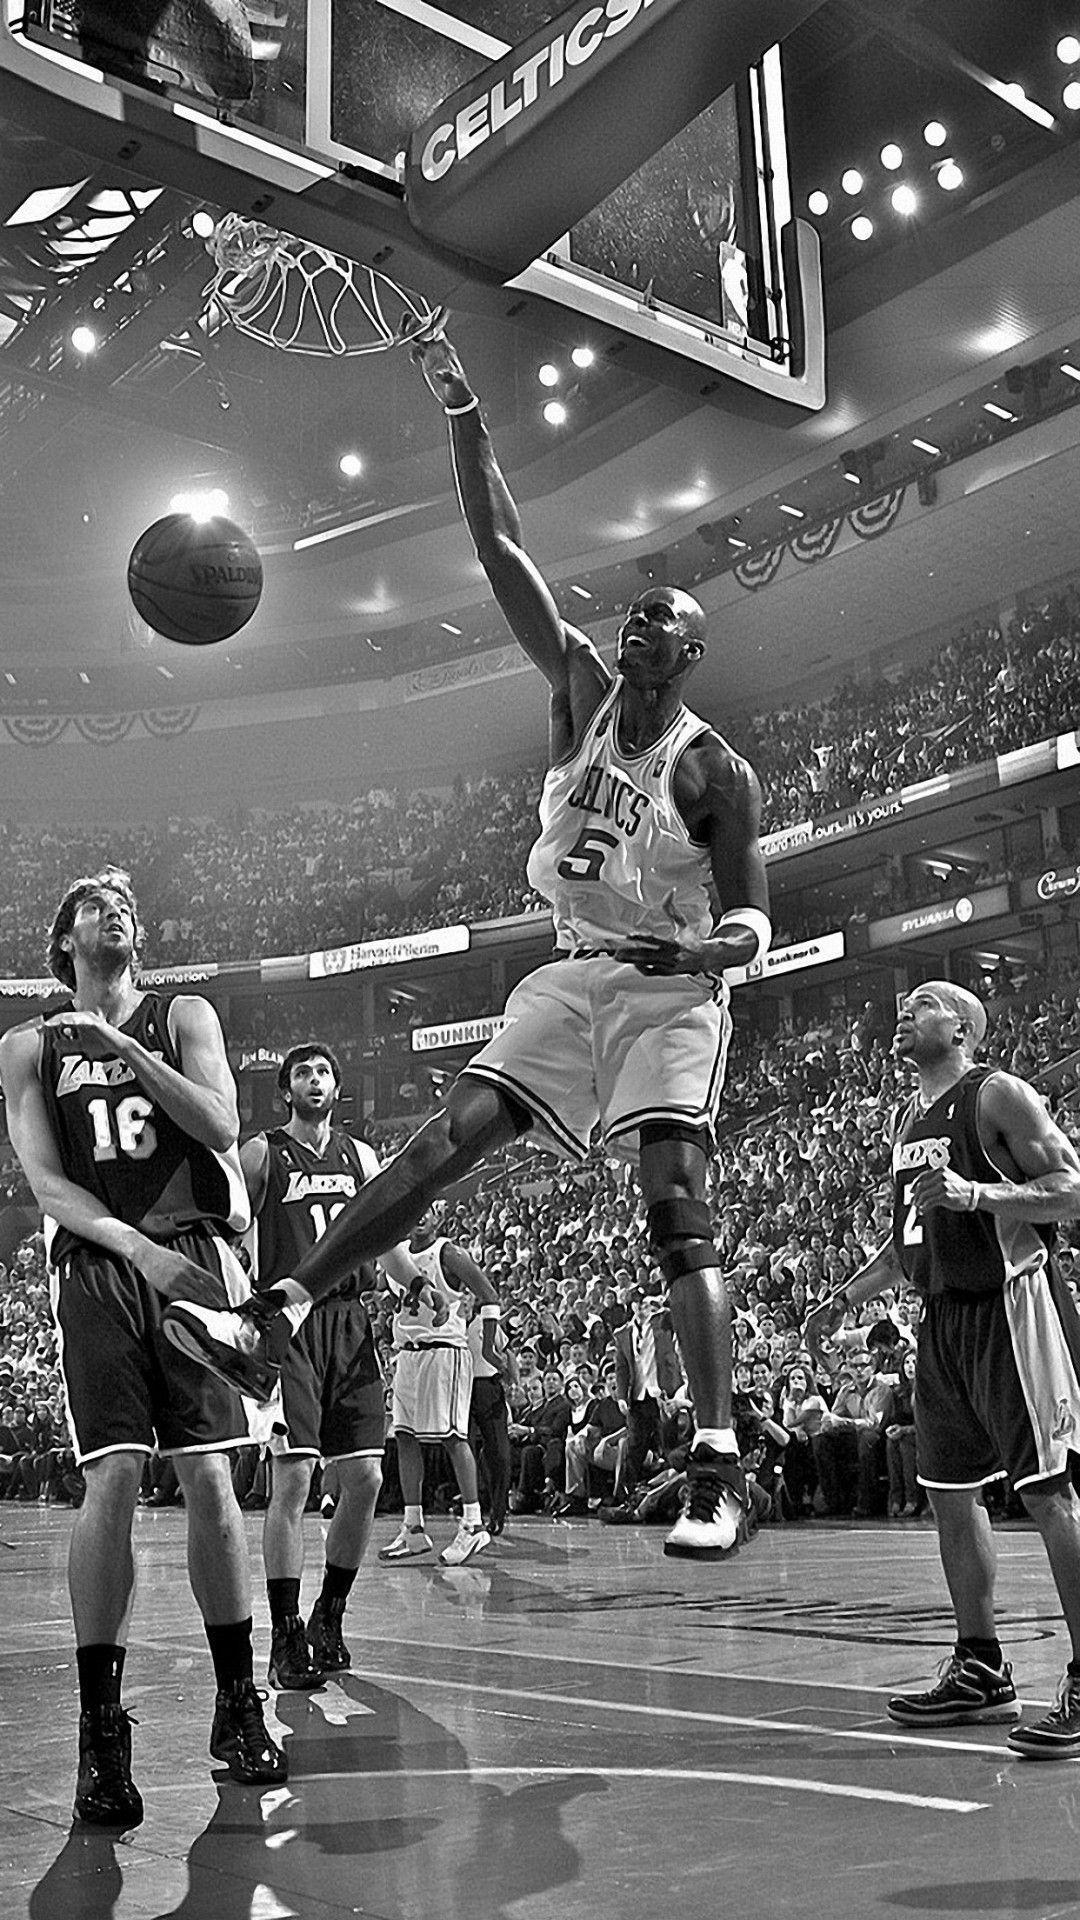 Iphone Basketball Player Wallpaper Hd